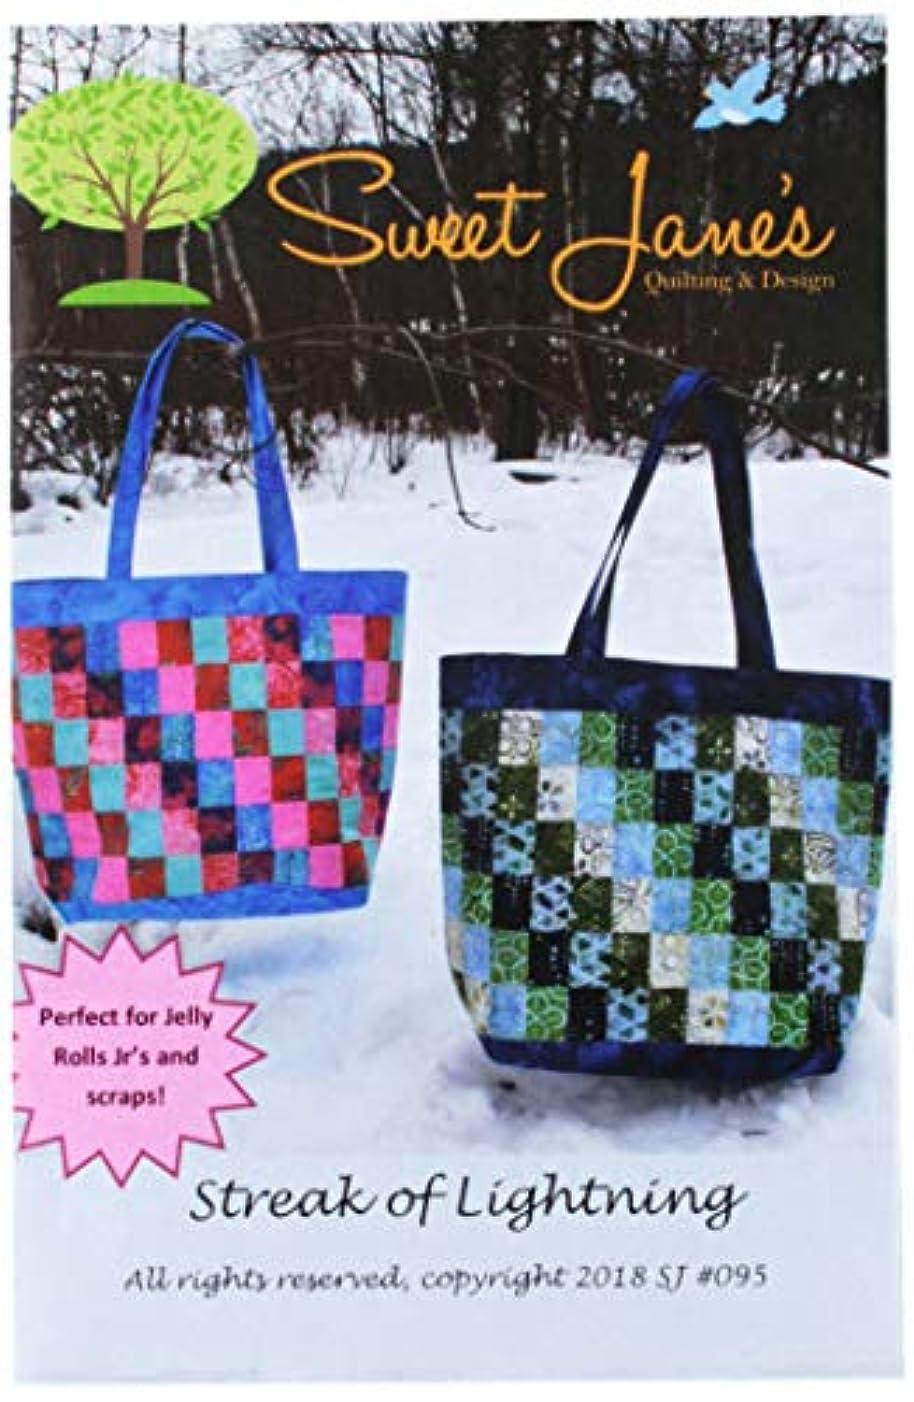 Sweet Jane's Quilting & Design SJ095 Streak of Lightening Pattern